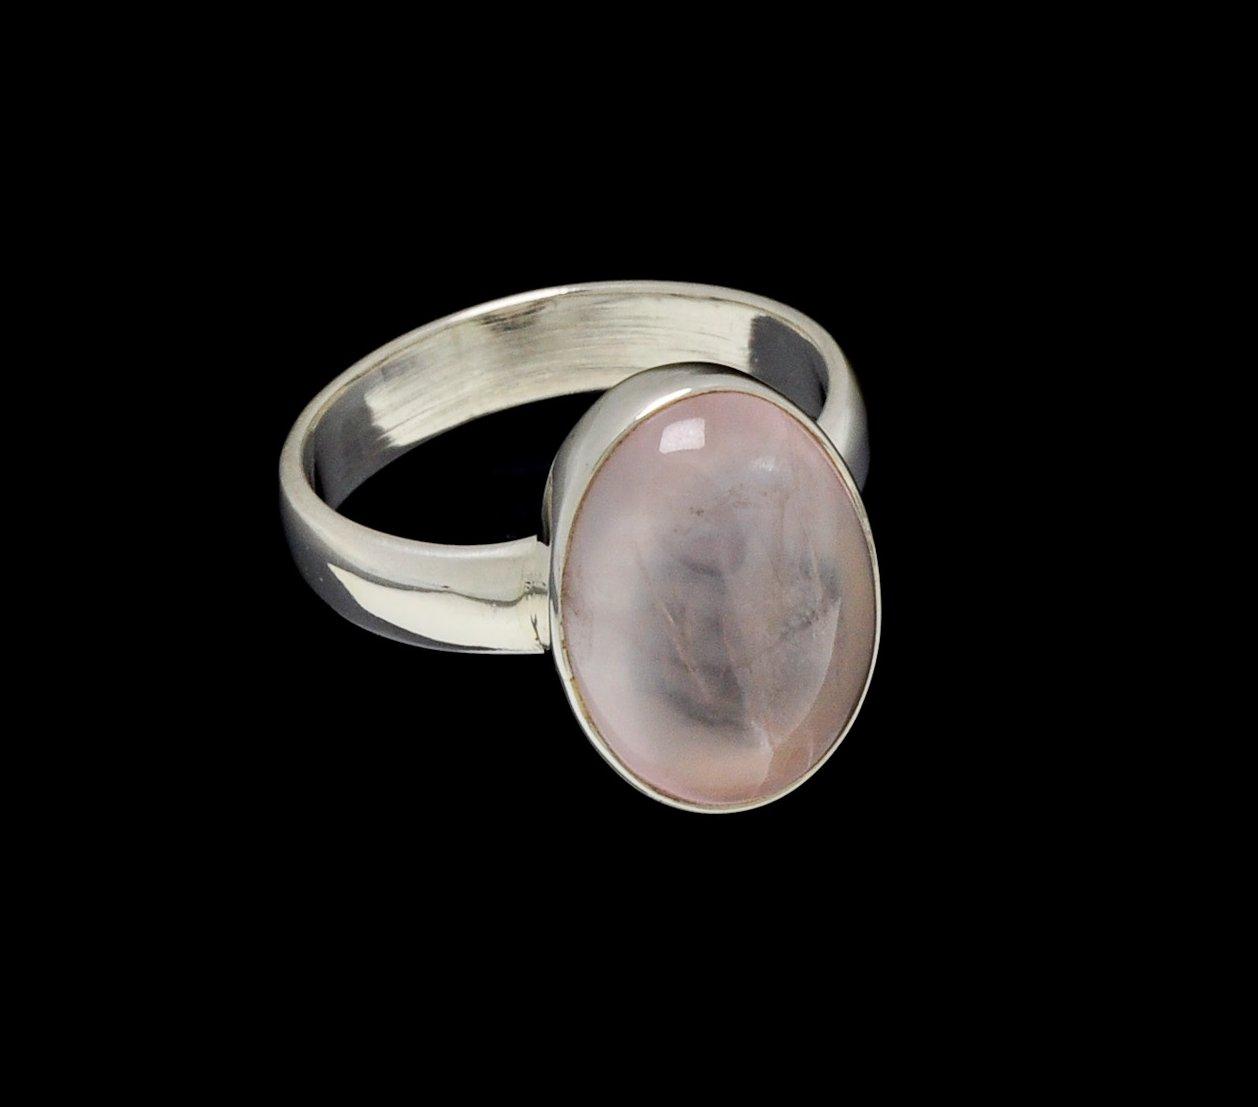 Rose Quartz Ring 15mm x 10mm Oval Cut